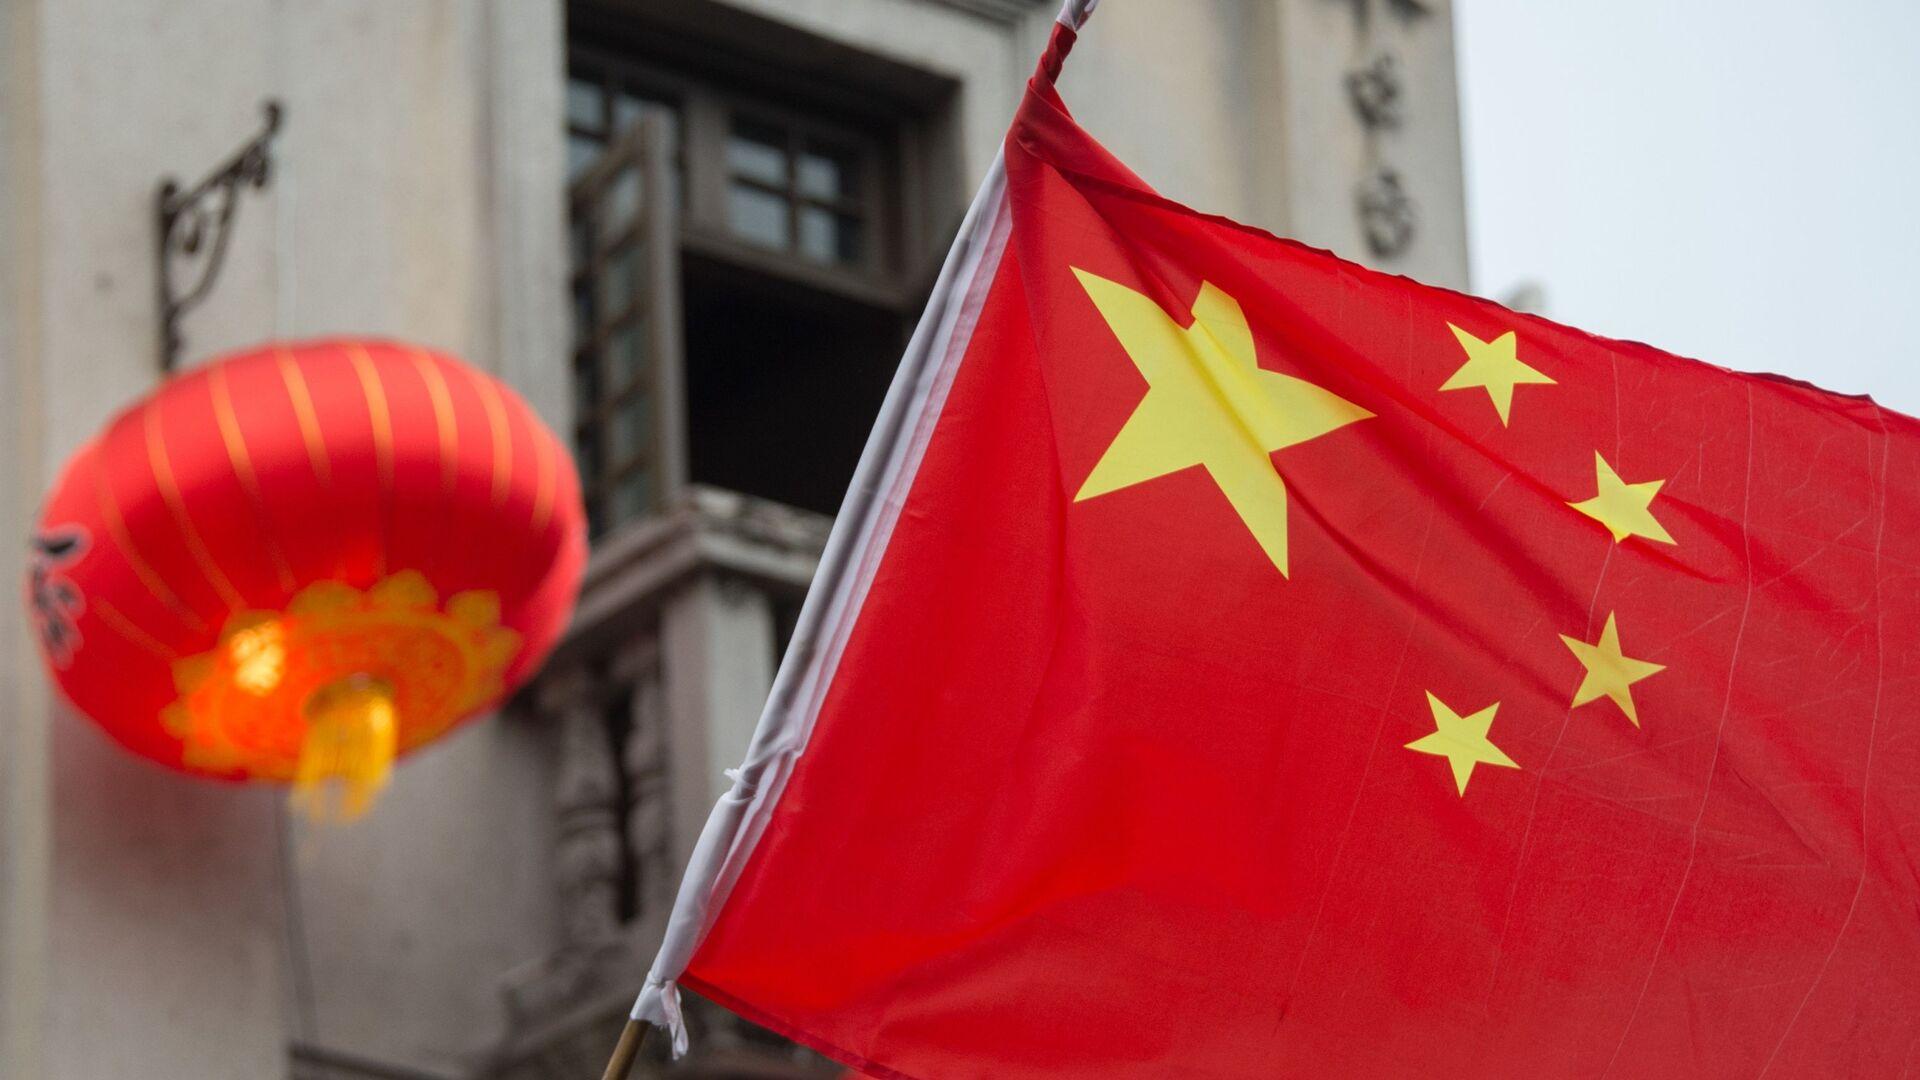 La bandera de China - Sputnik Mundo, 1920, 24.02.2021